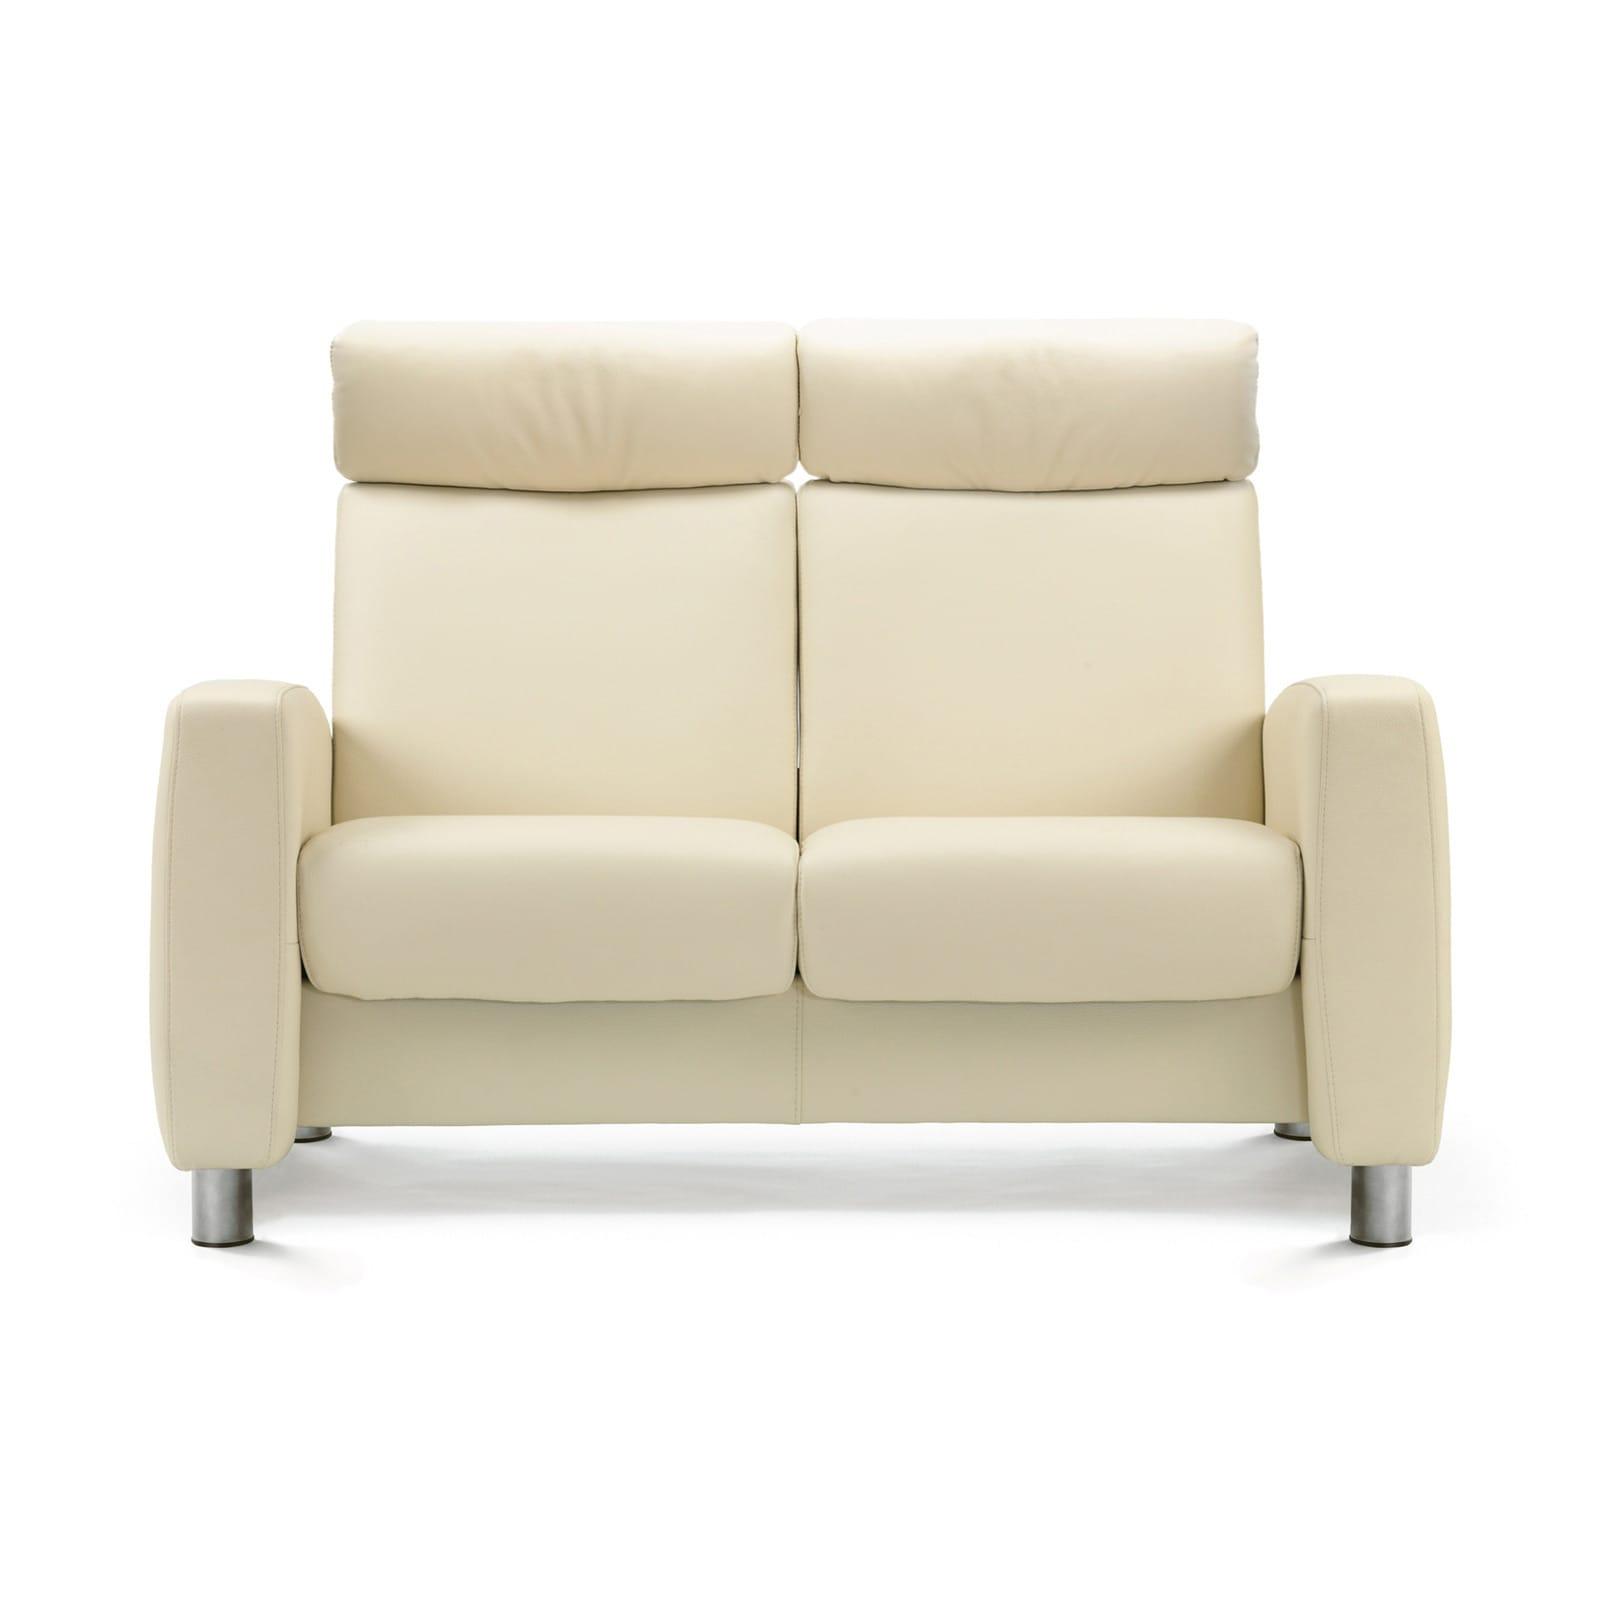 stressless sofa 2 sitzer arion m hoch vanilla stahl. Black Bedroom Furniture Sets. Home Design Ideas